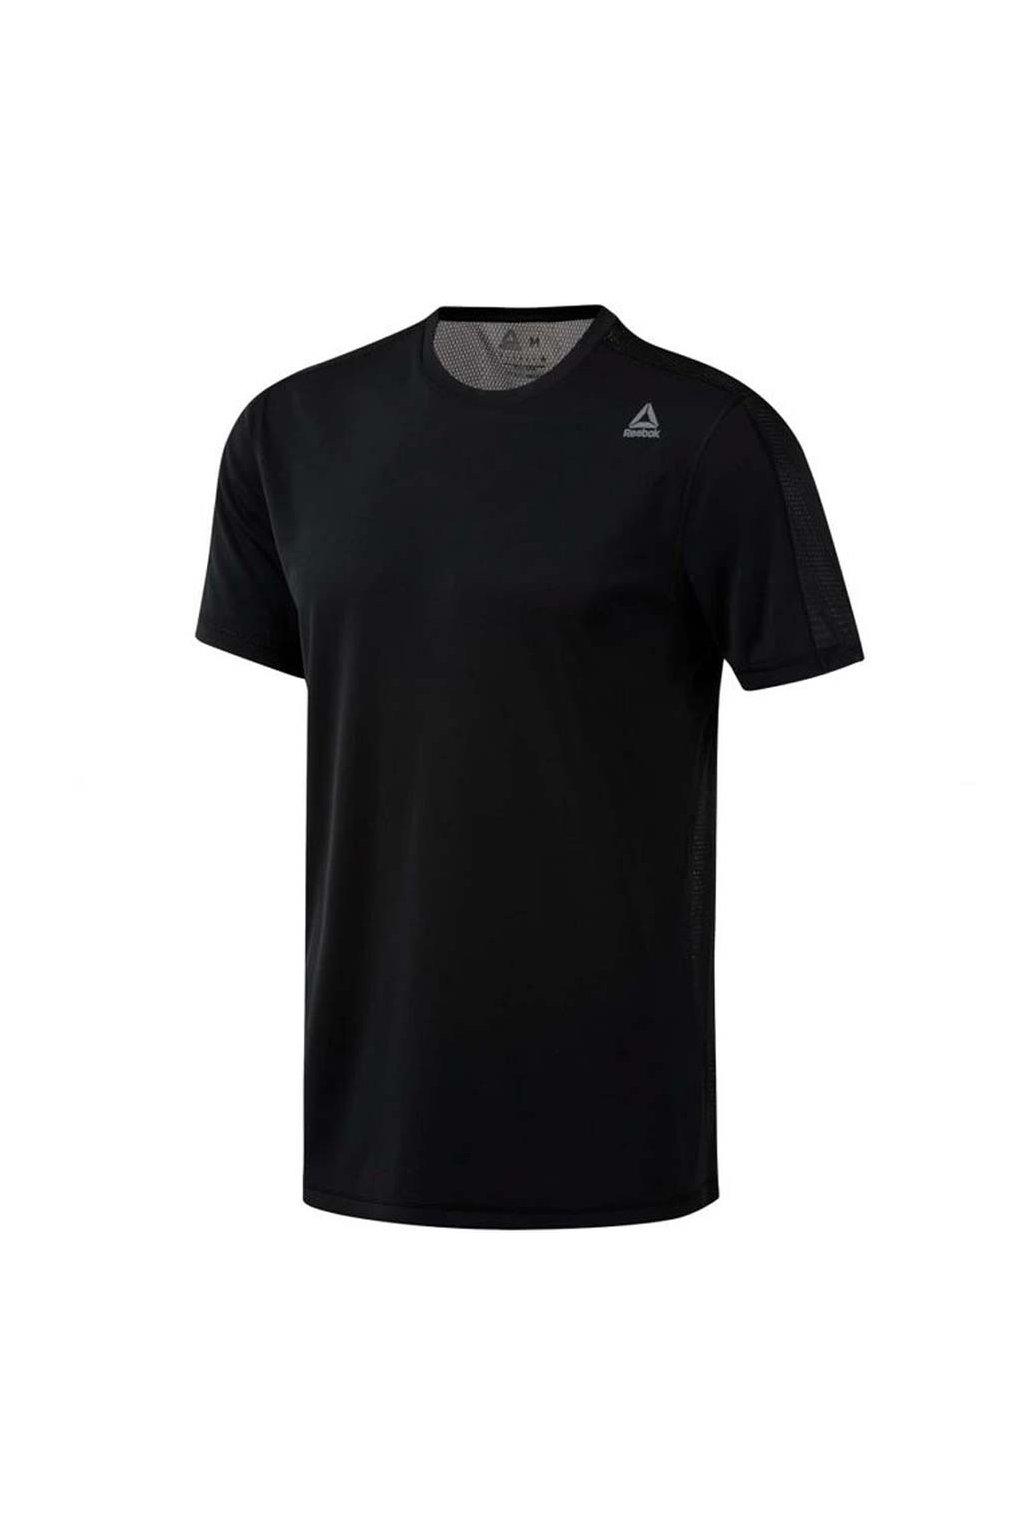 Pánske tričko Reebok Workout Tech Top čierne DU2183